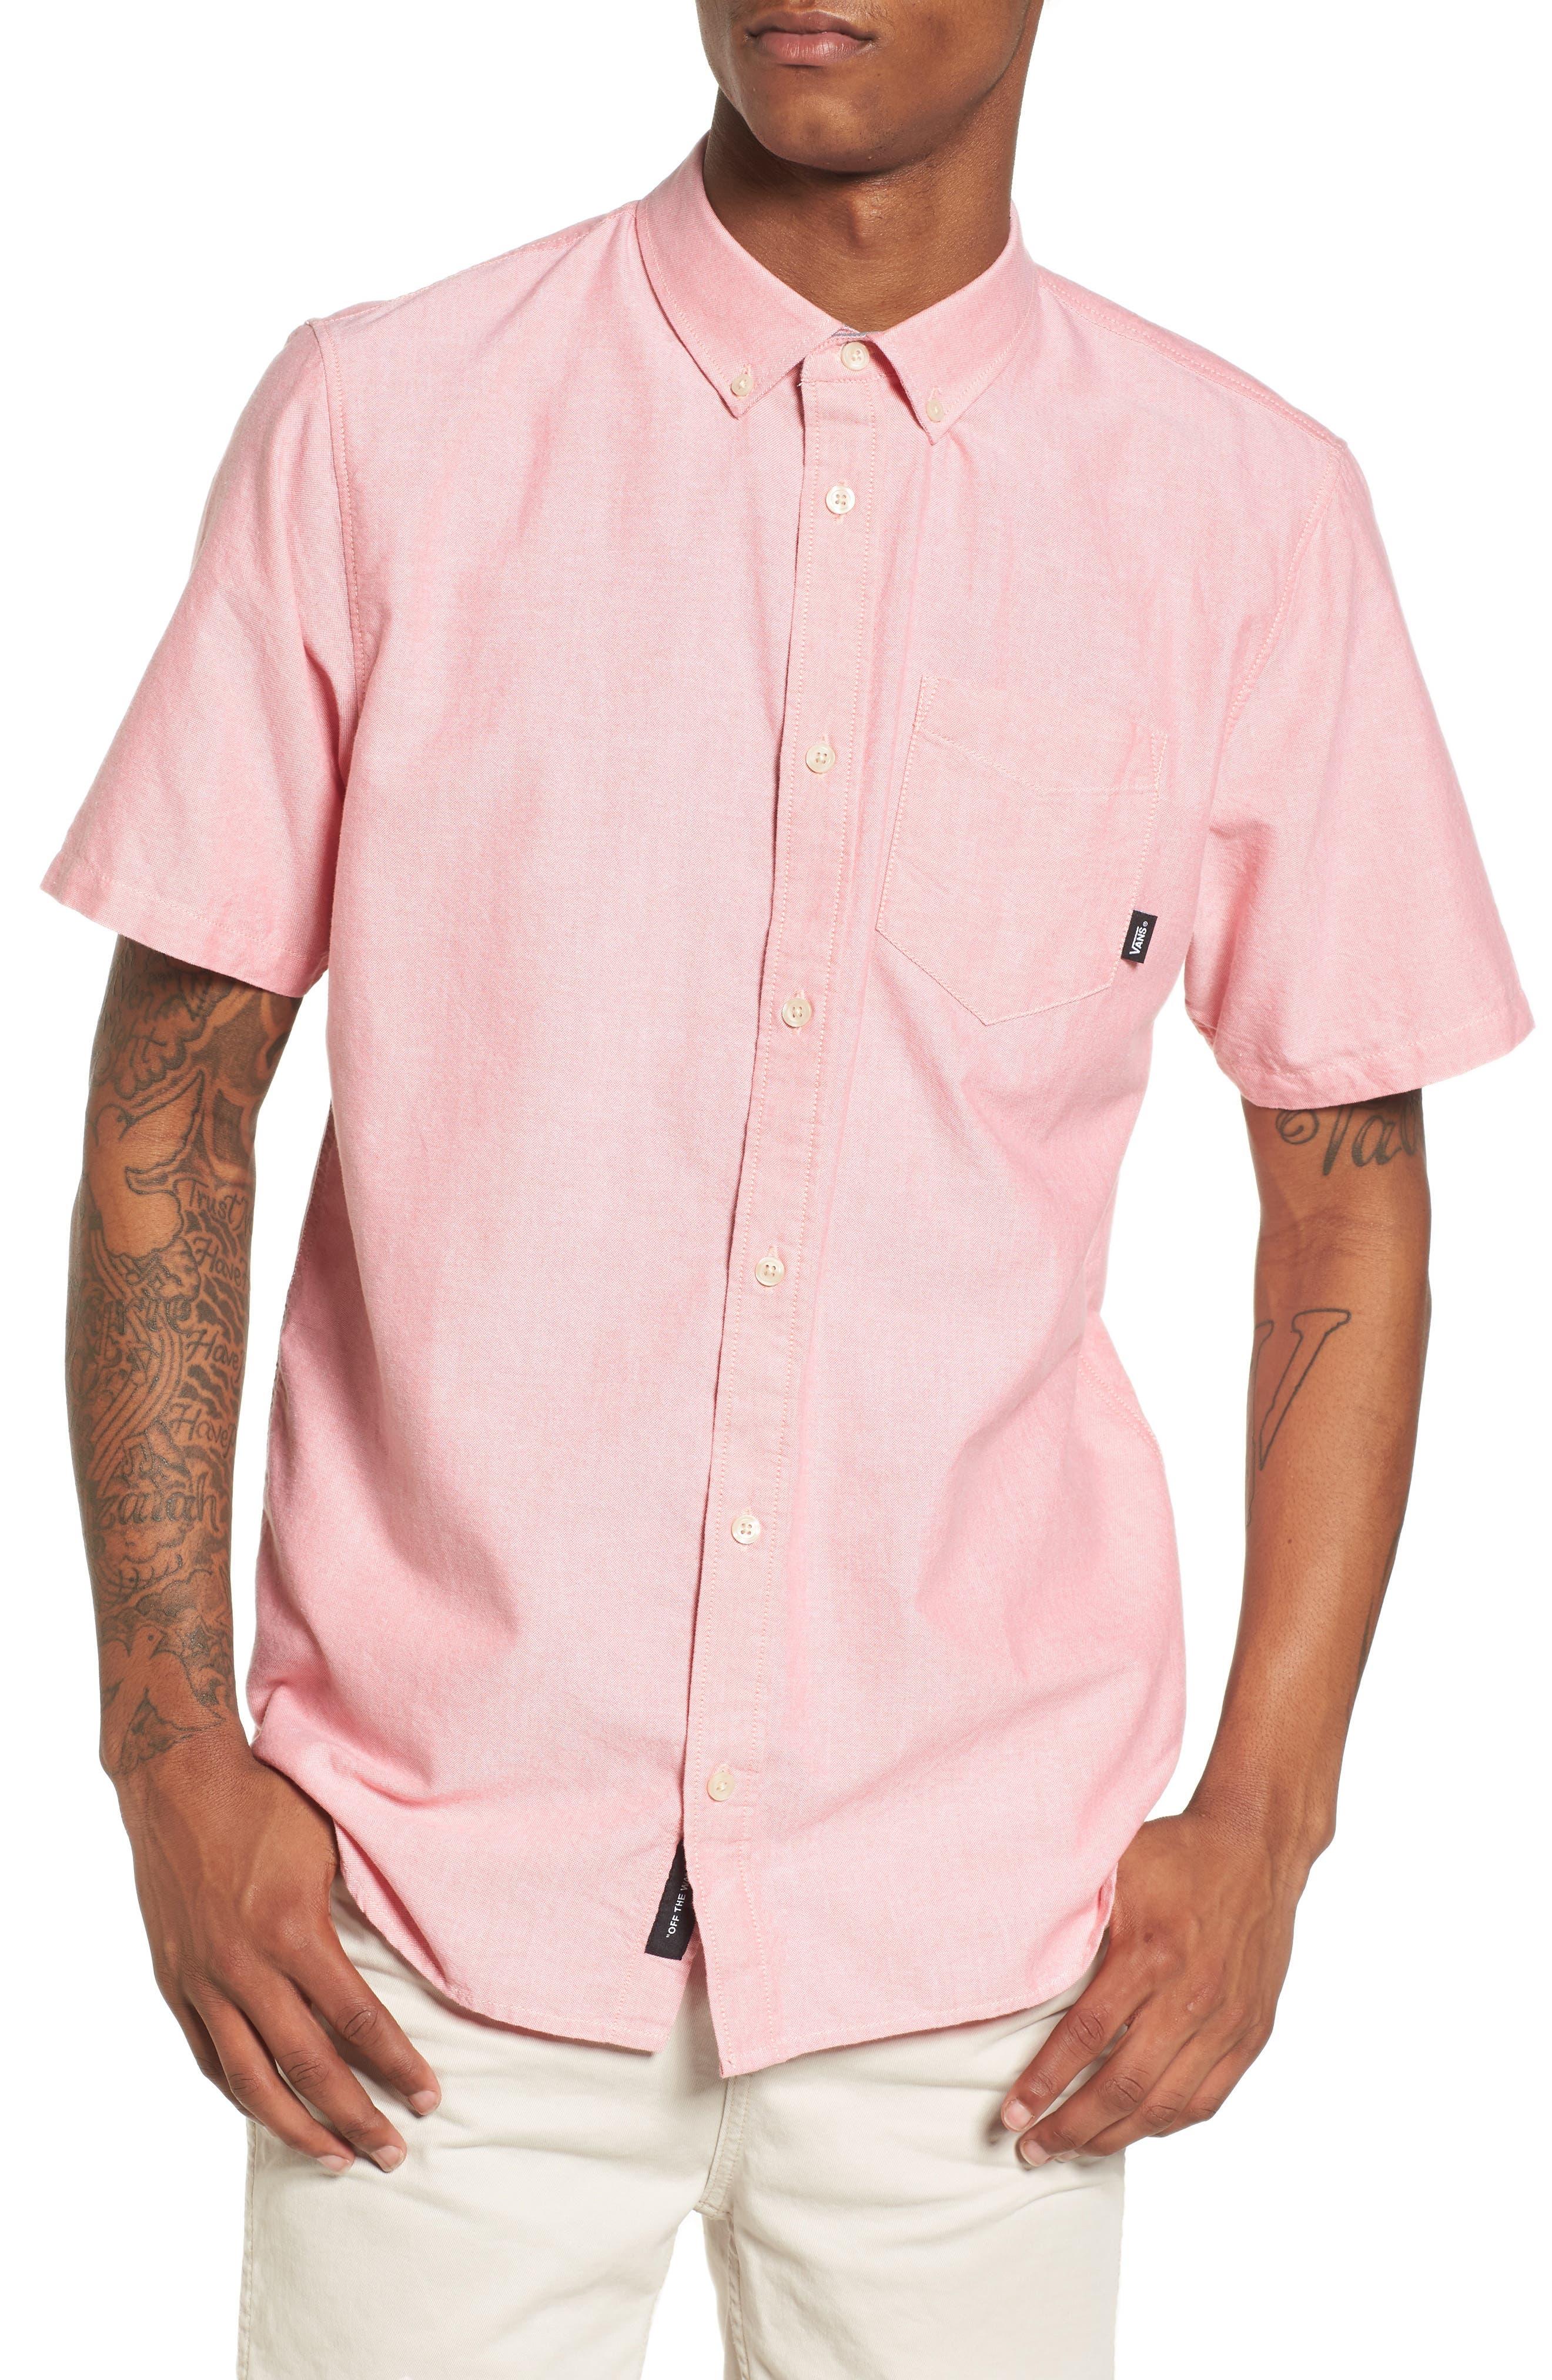 Houser Solid Woven Shirt,                             Main thumbnail 1, color,                             950